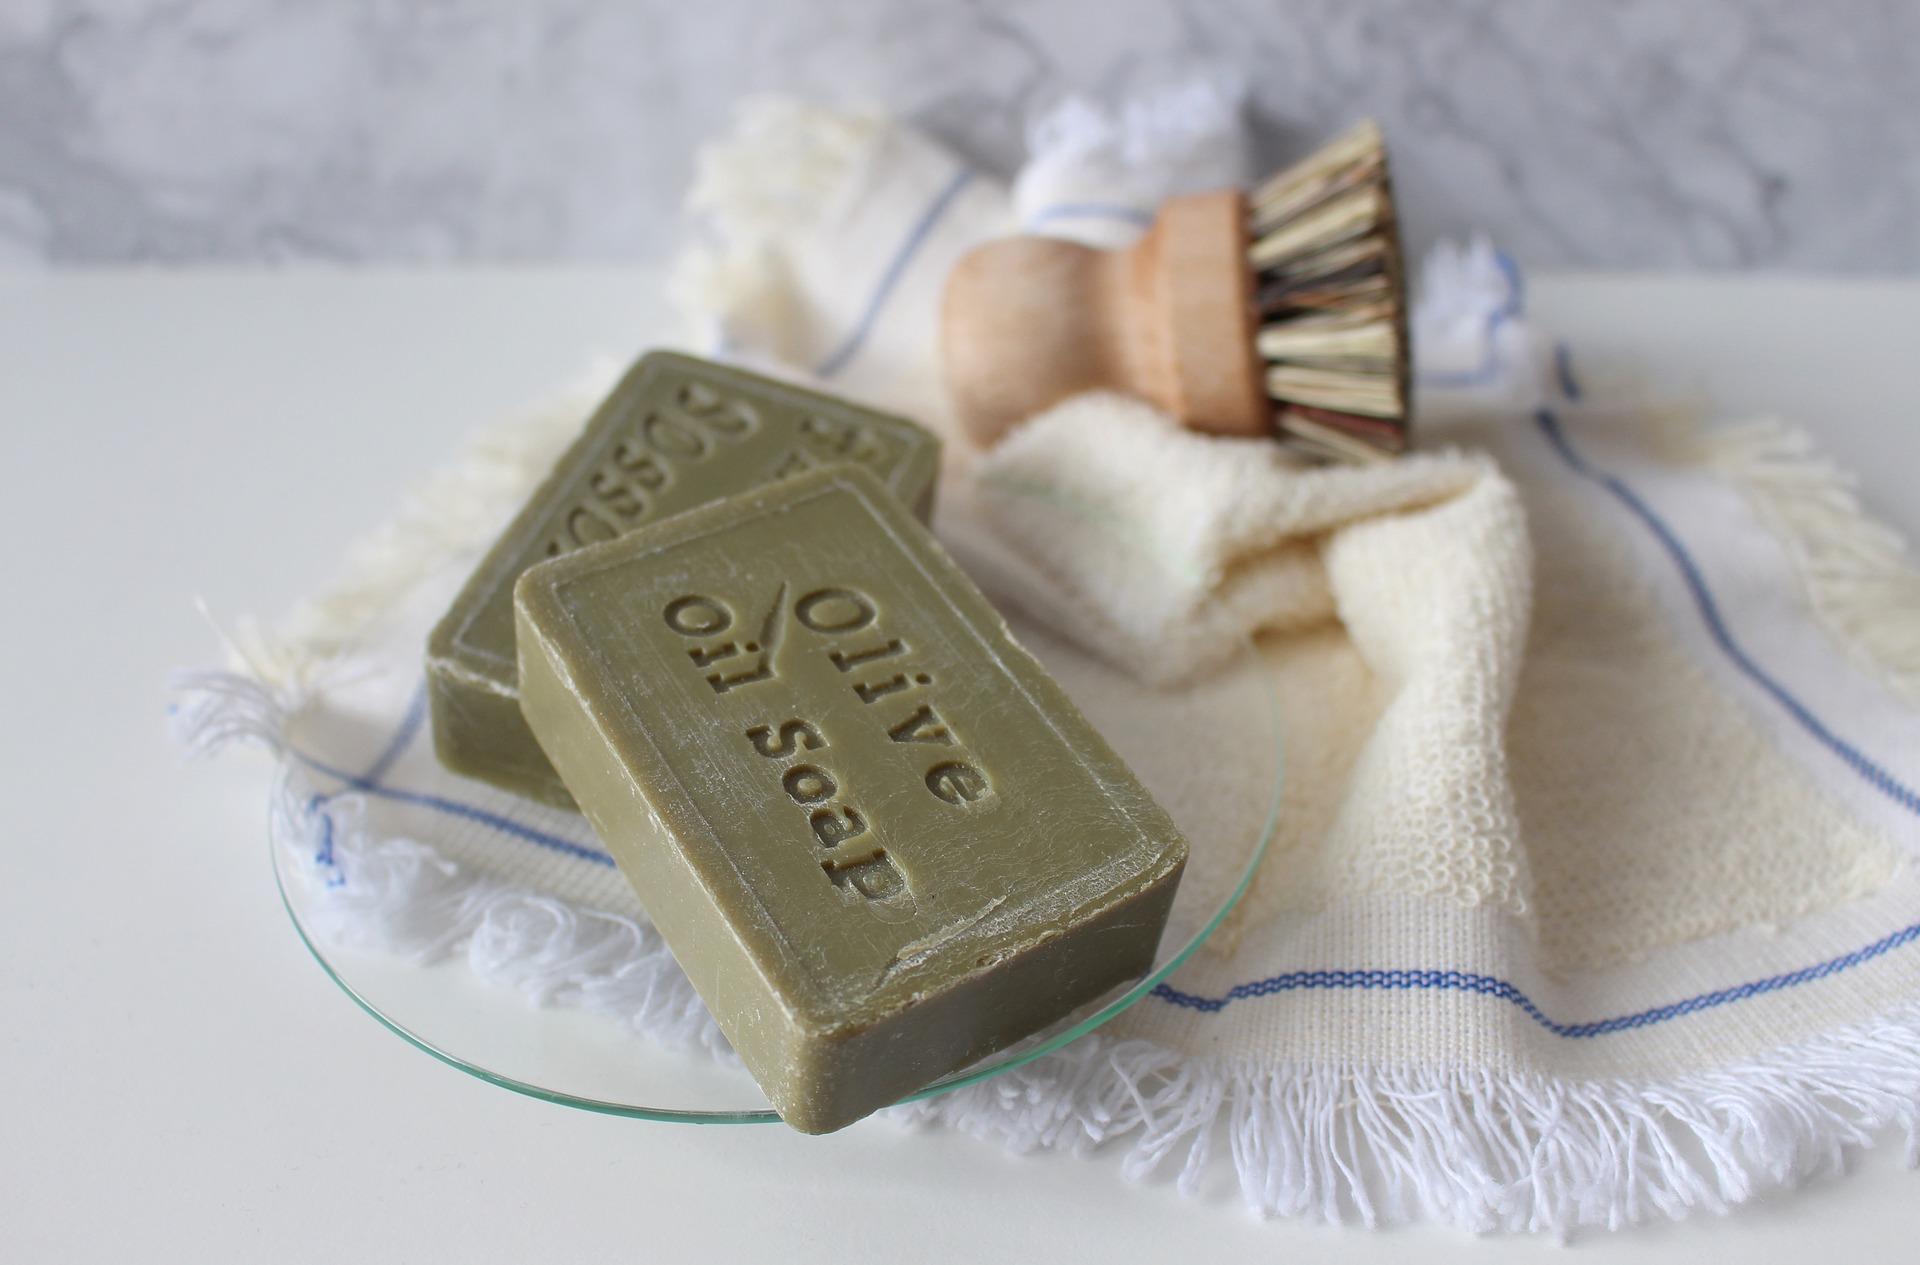 soap-4017608_1920.jpg